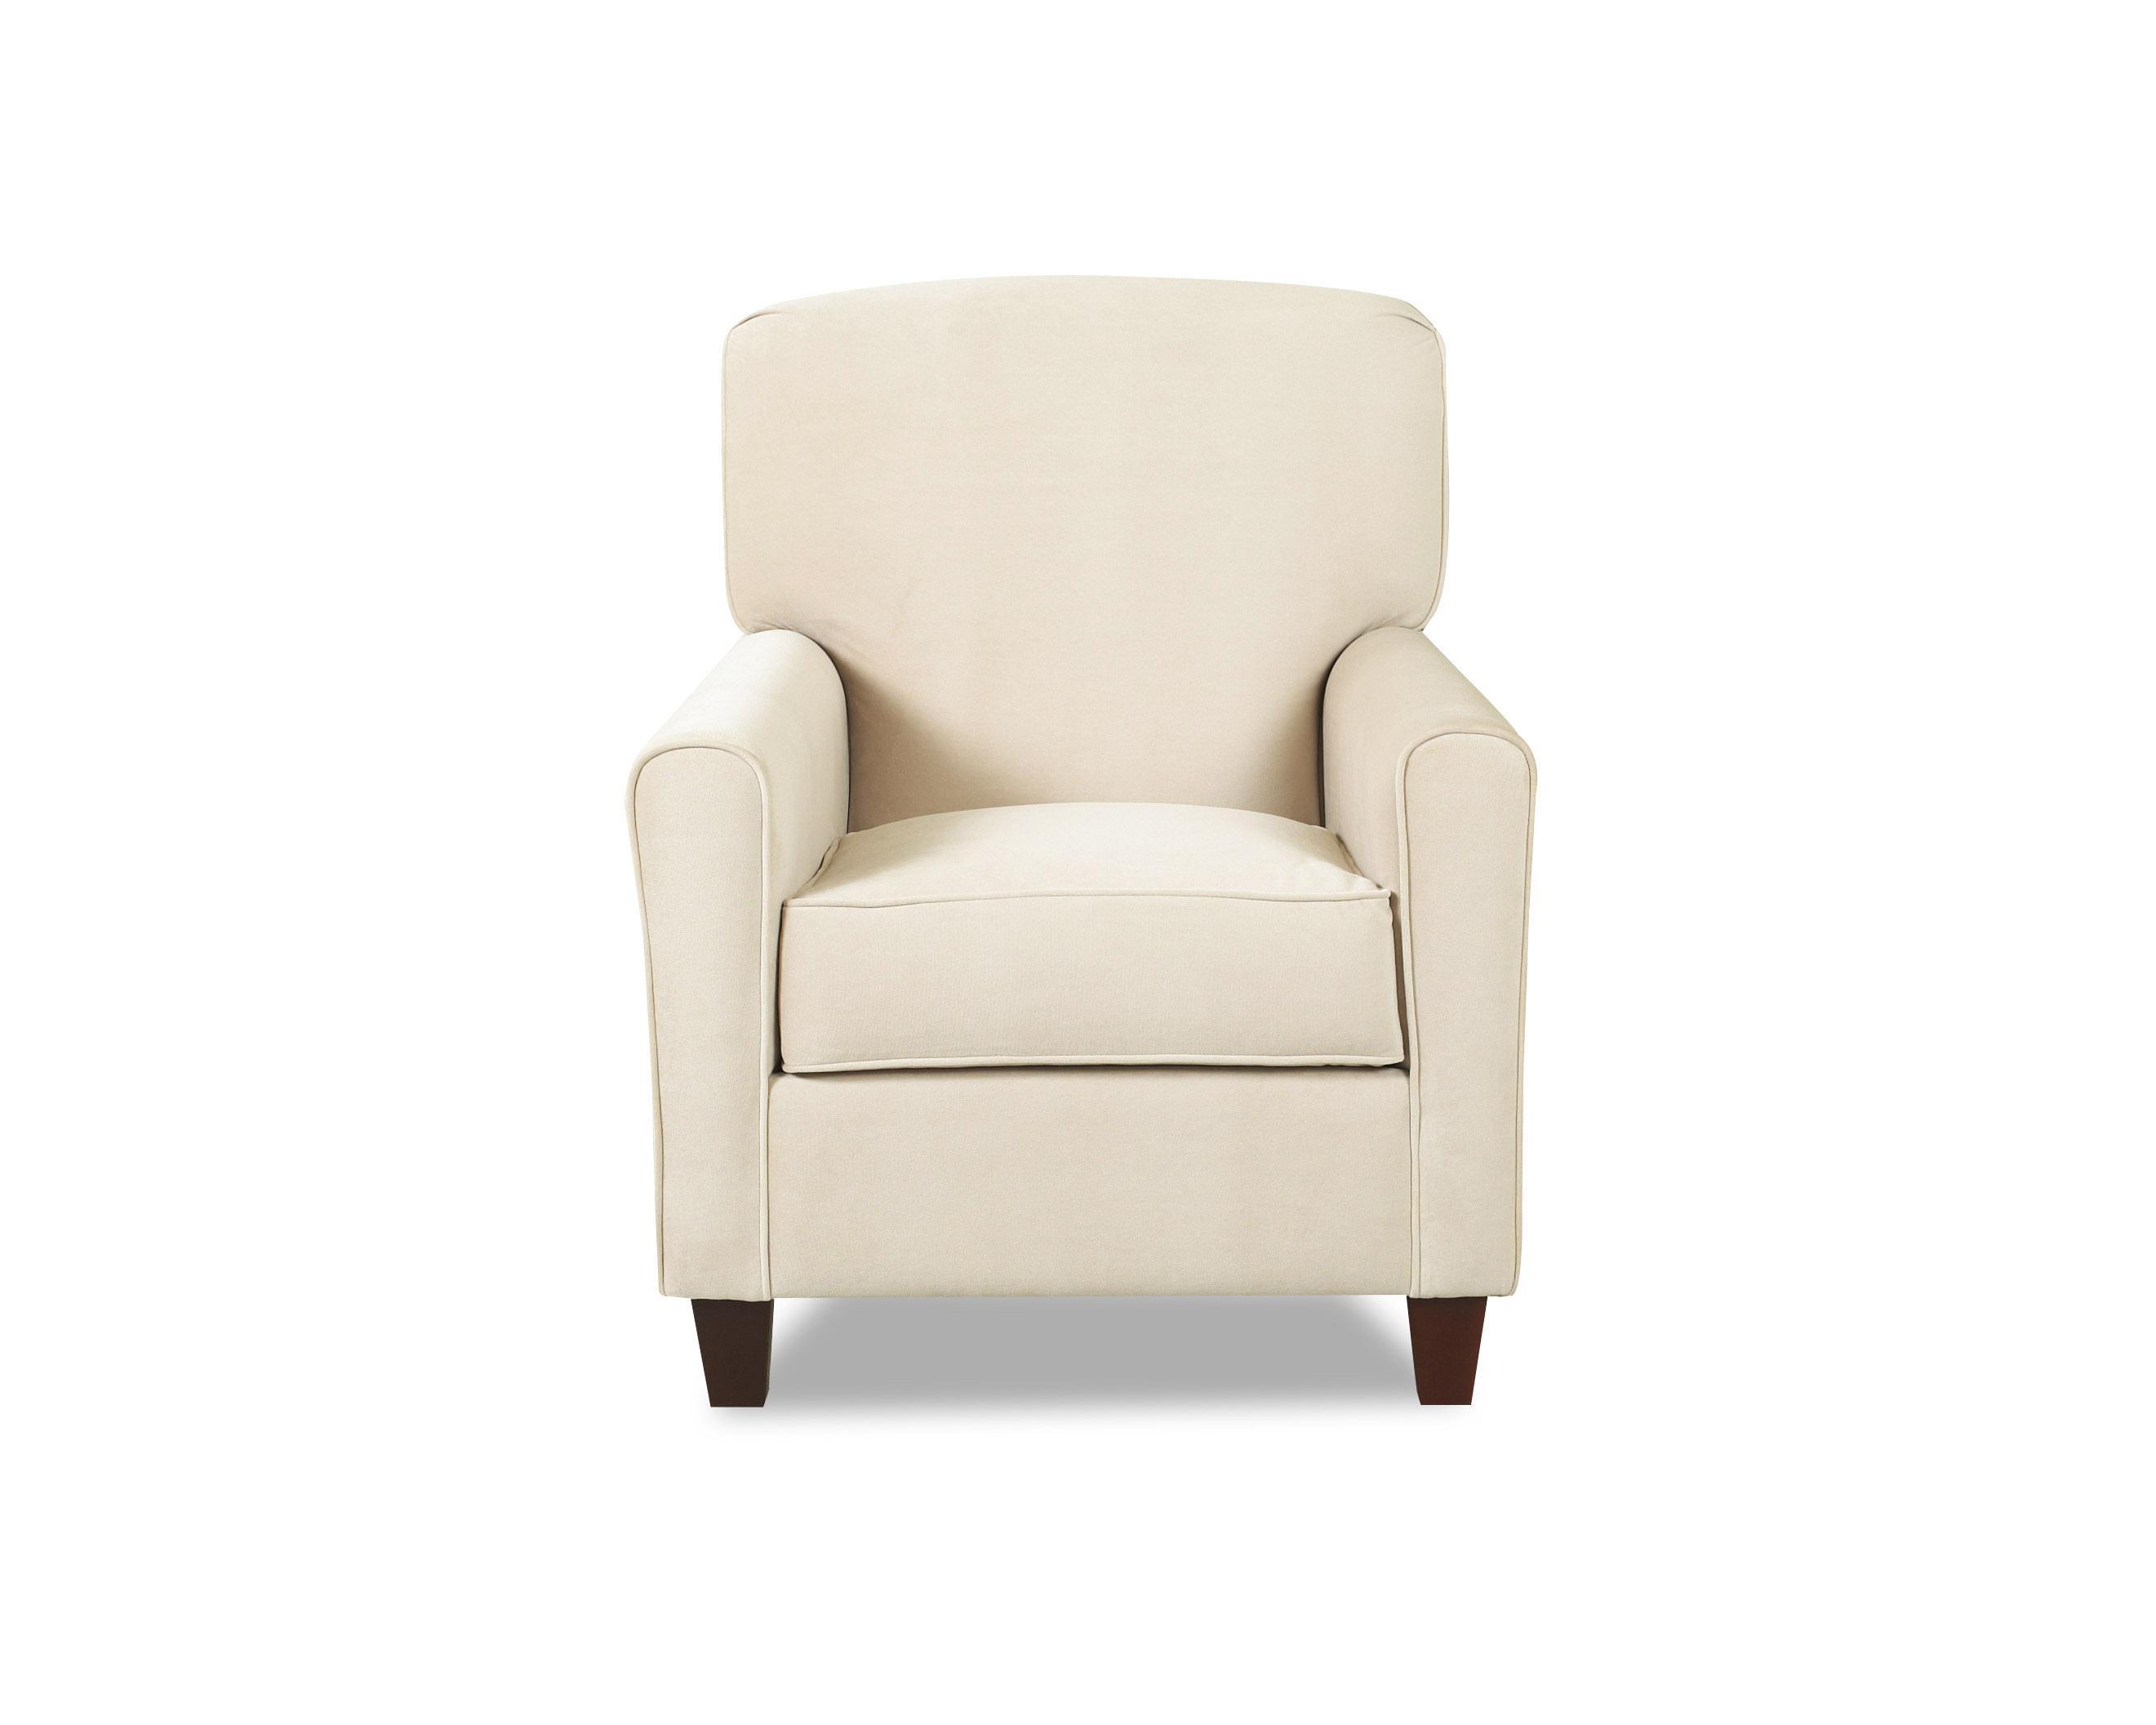 Klaussner Hybrid Chair - Item Number: 54400 C